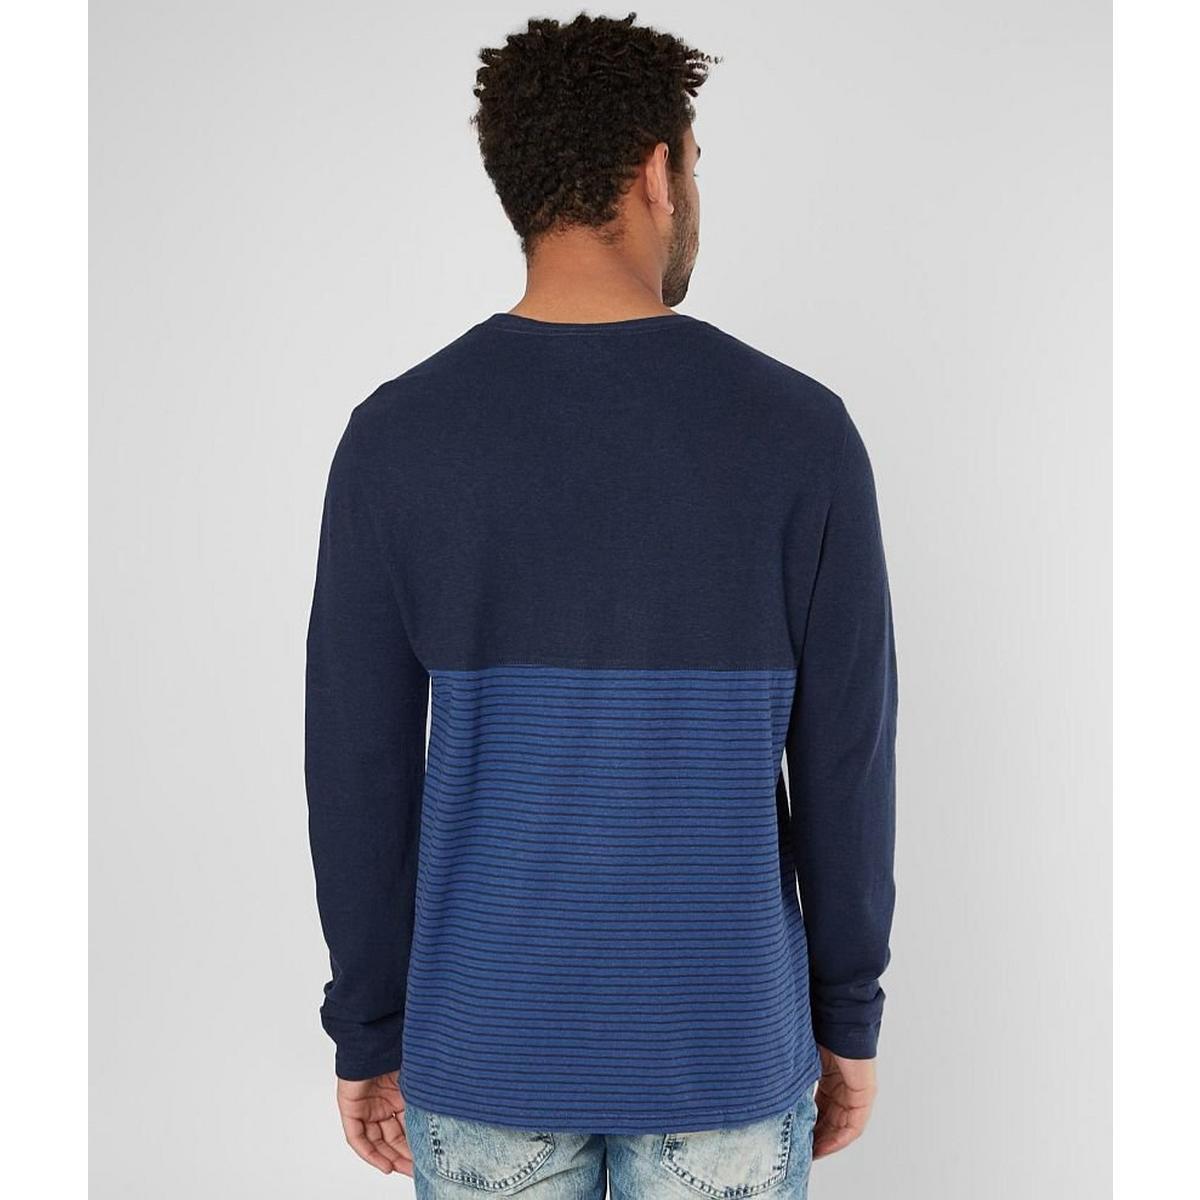 Tentree Men's Gunnison Pocket Long Sleeve Top